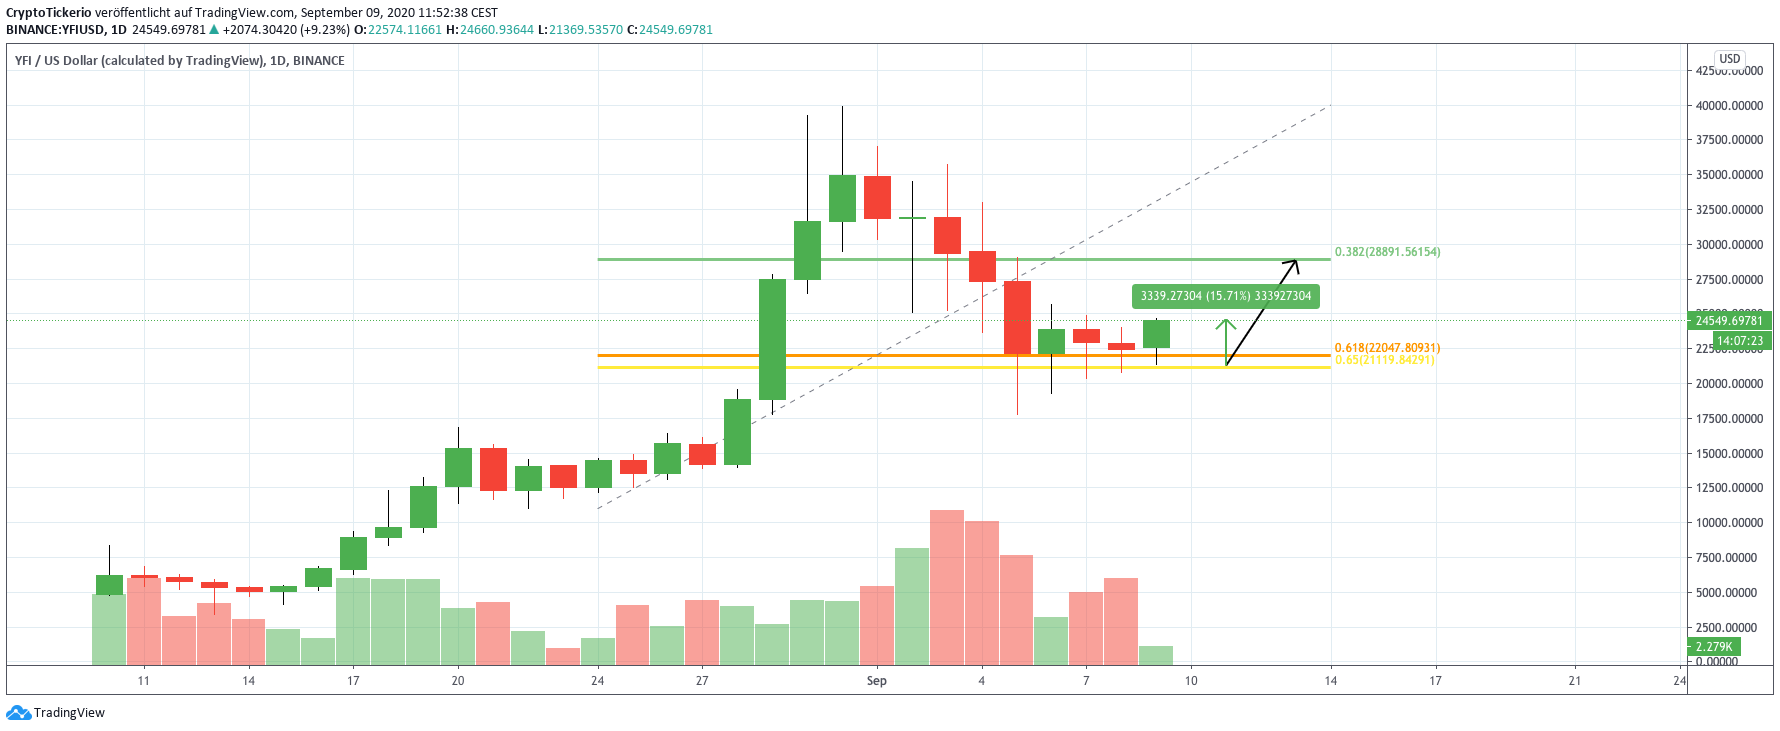 YFI/USD Daily price chart